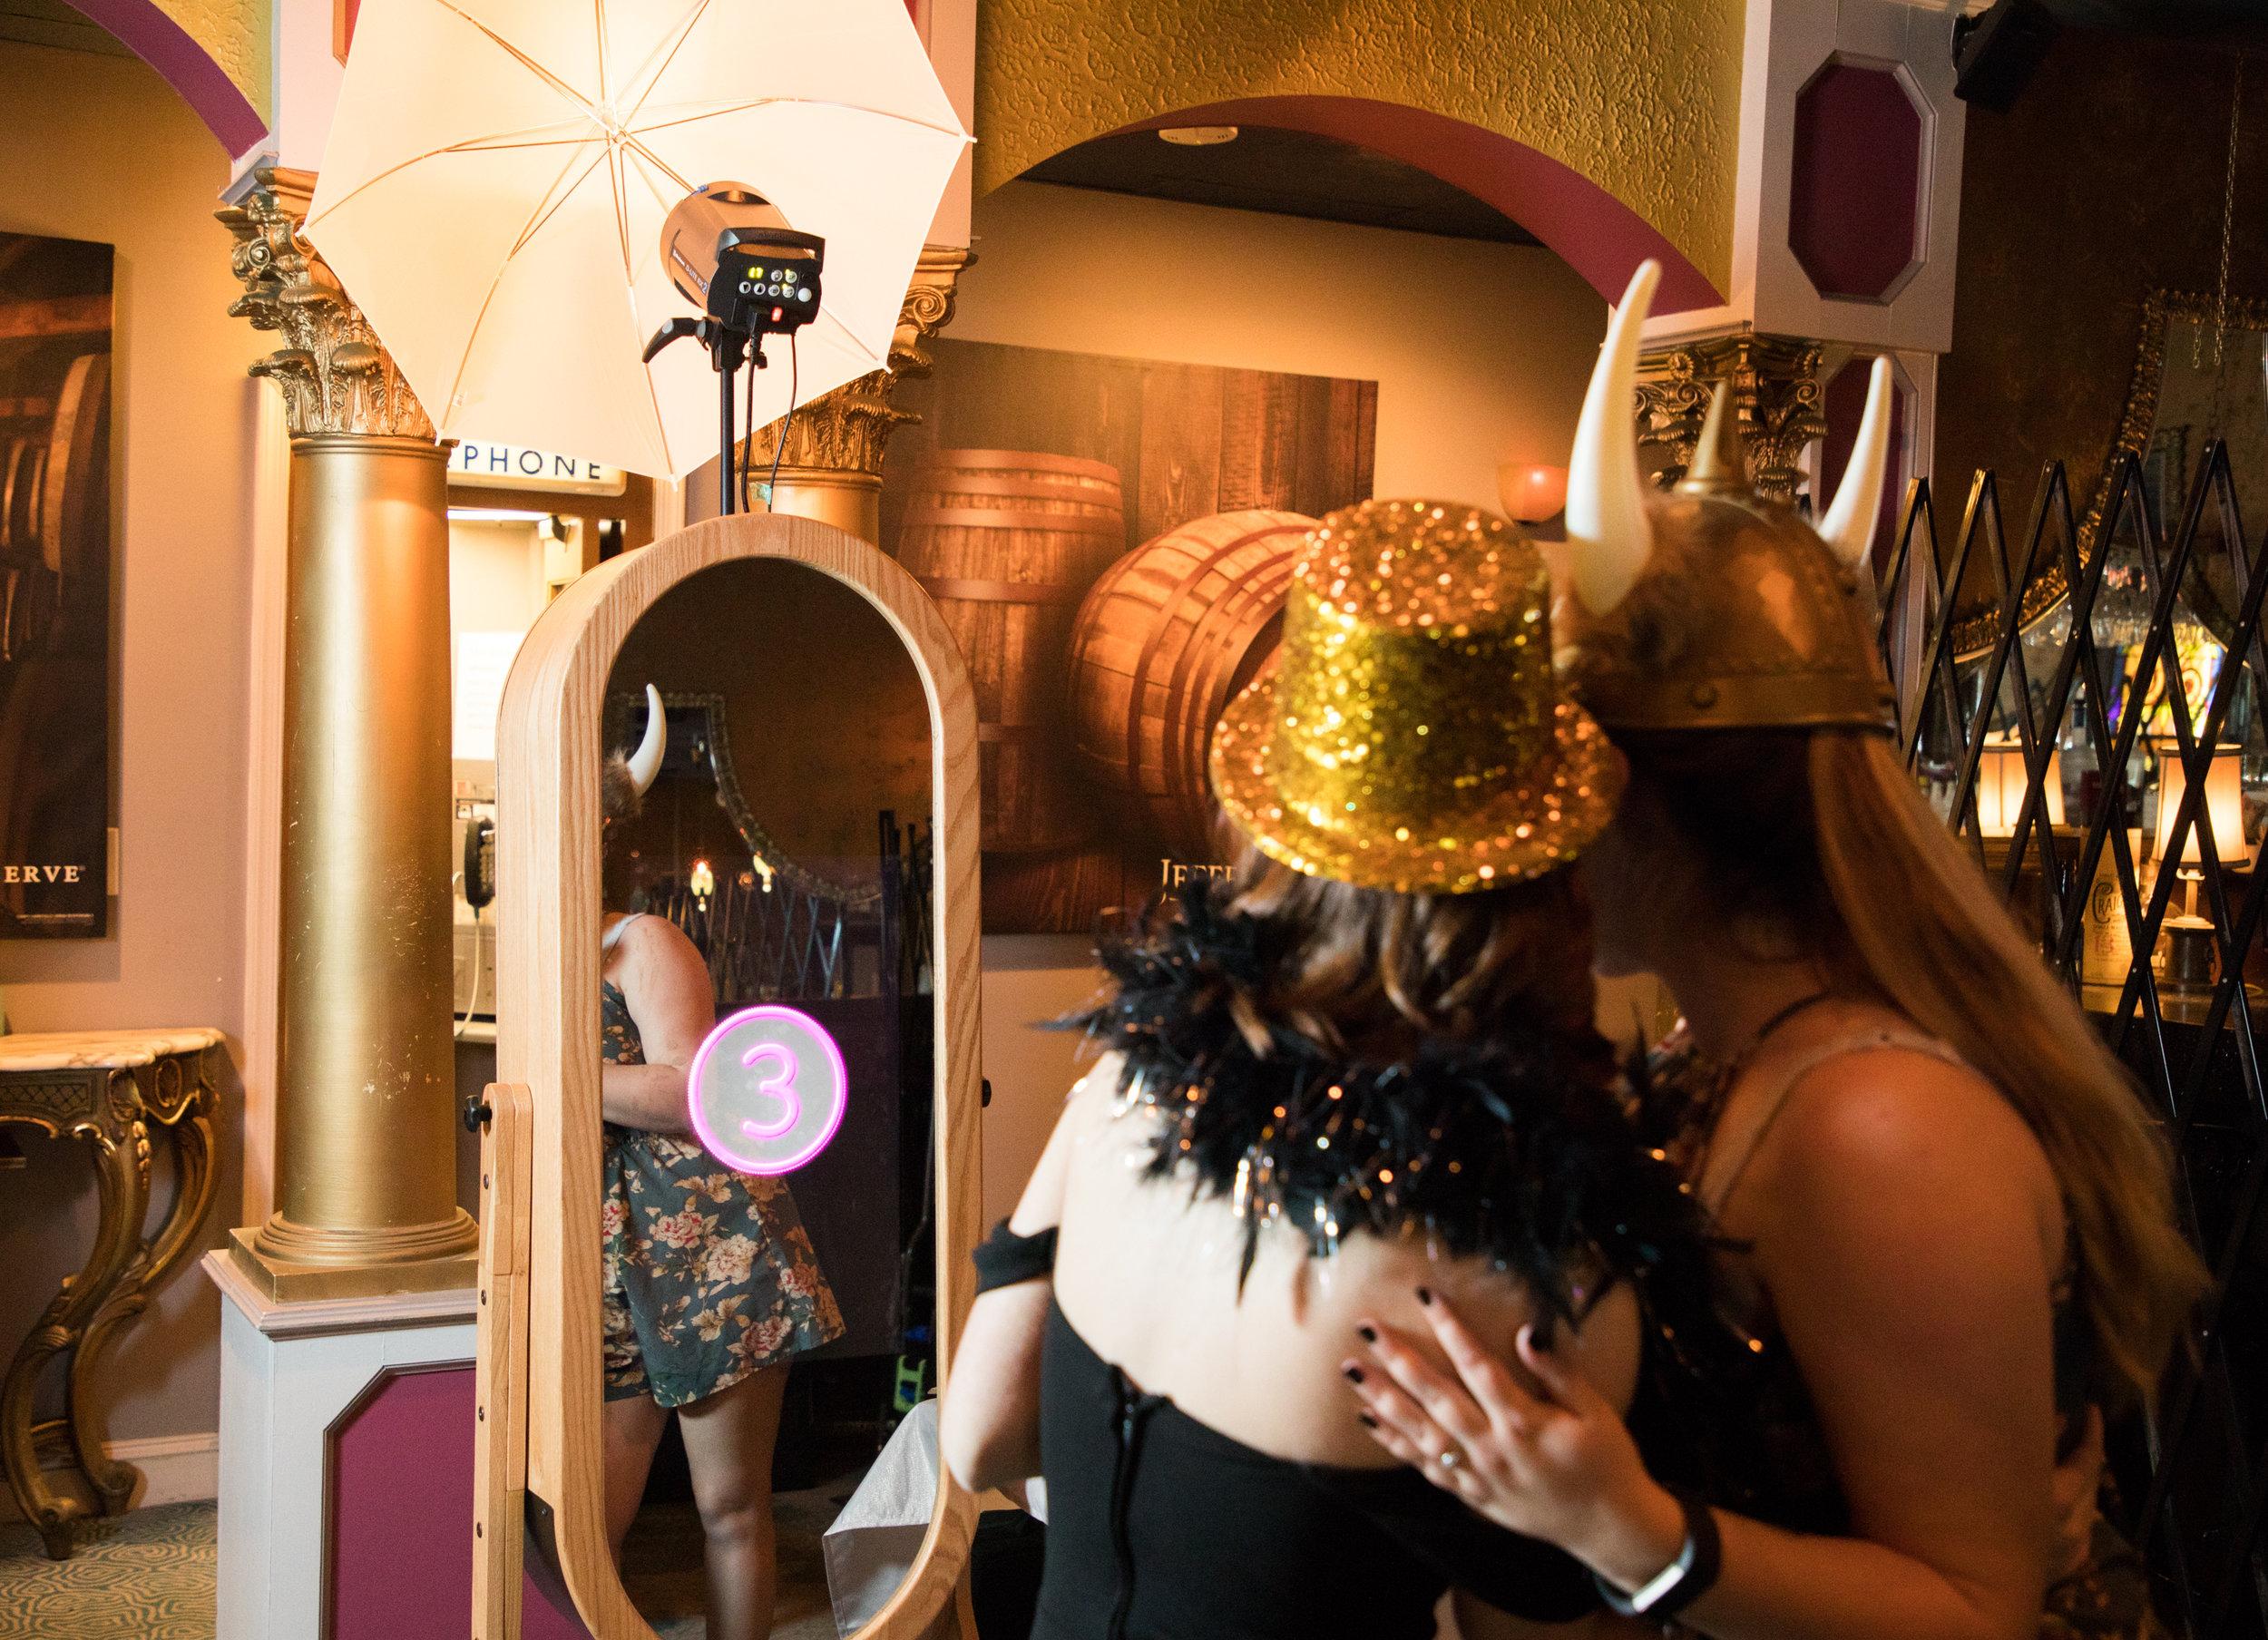 Jenna_Bill_retro_Mirror_booth_marketing-3.jpg